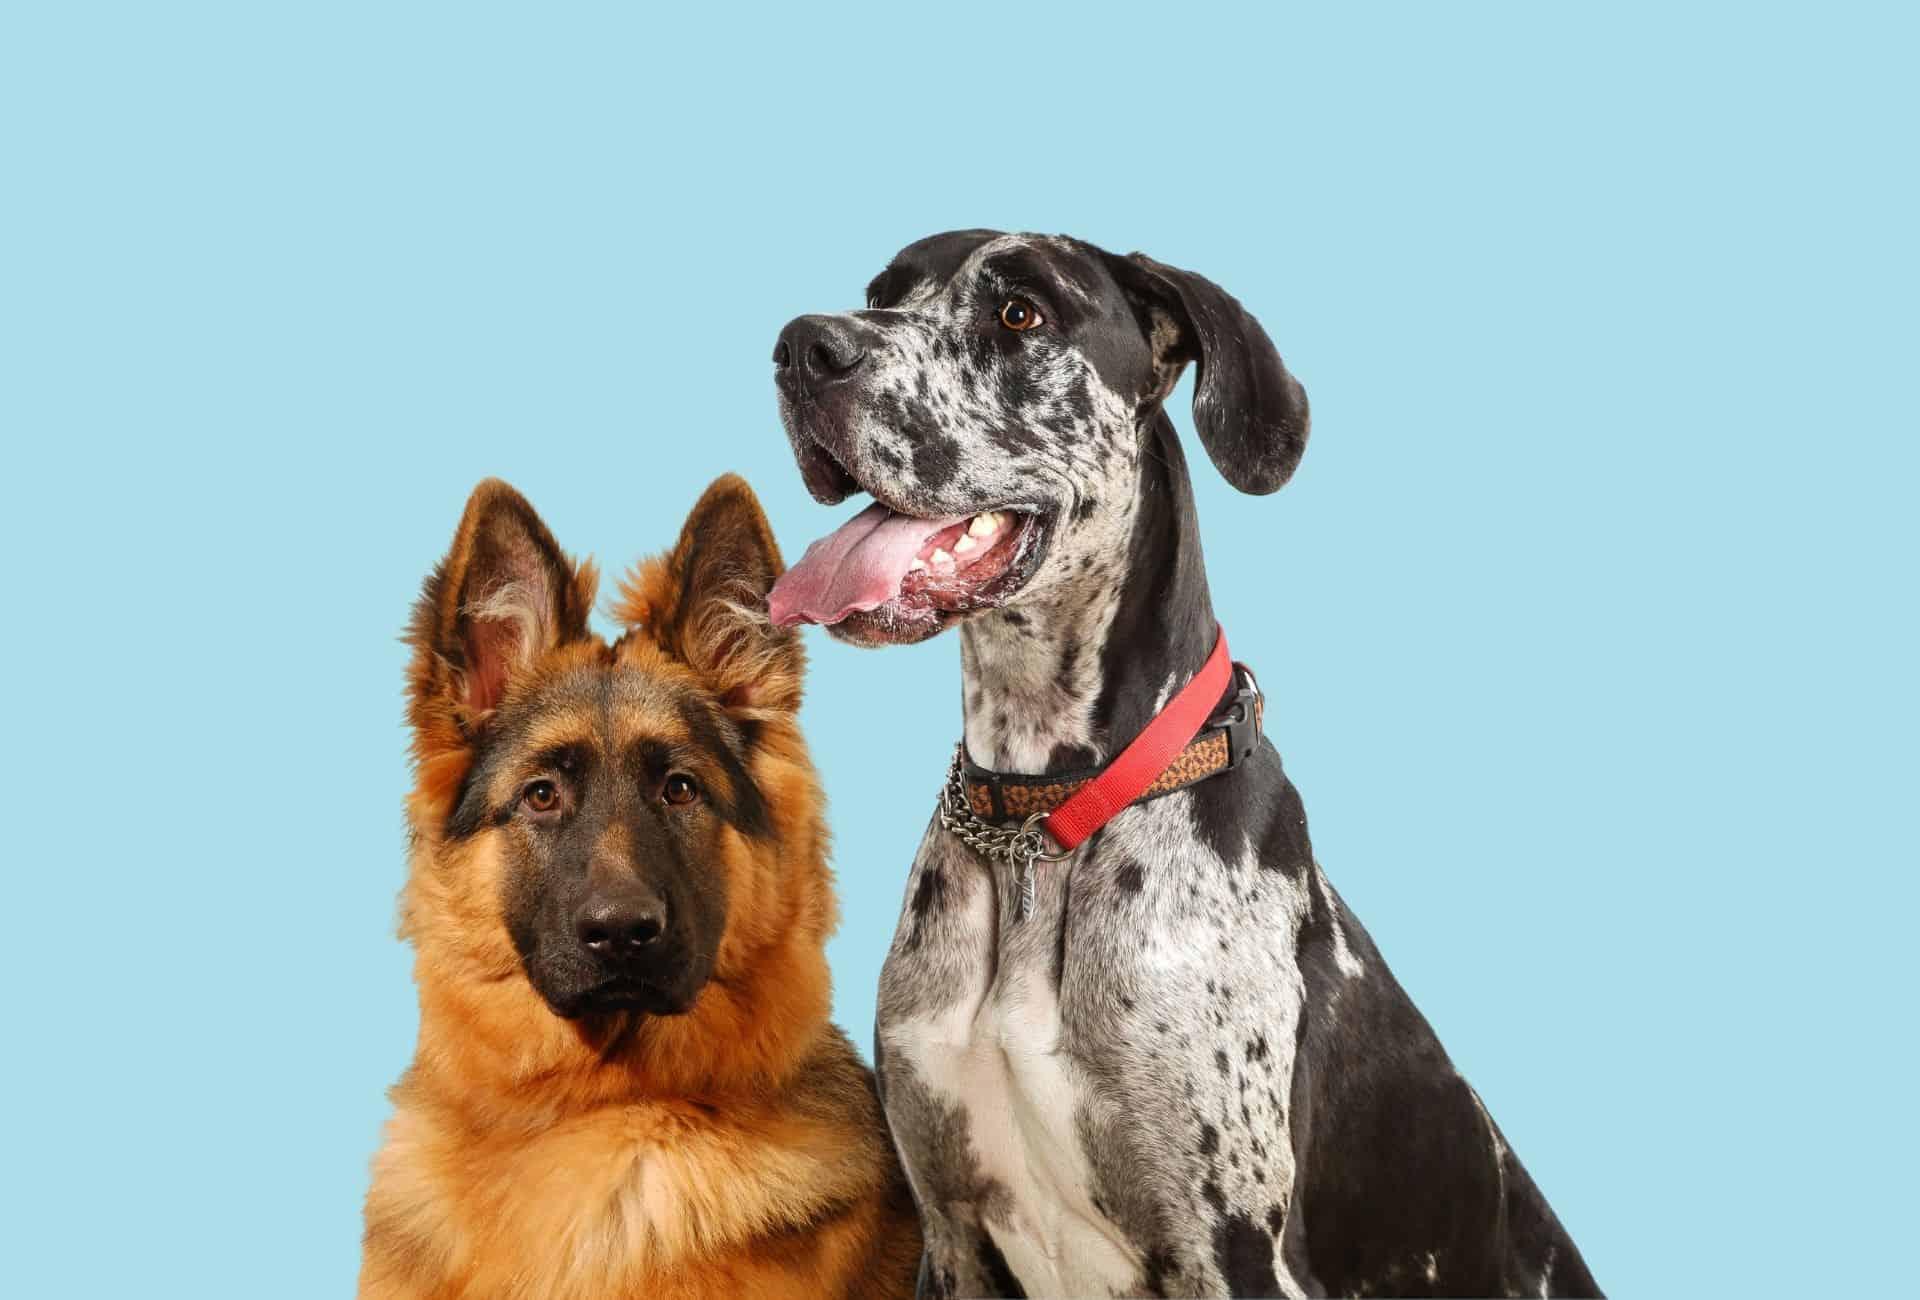 Great Dane and German Shepherd